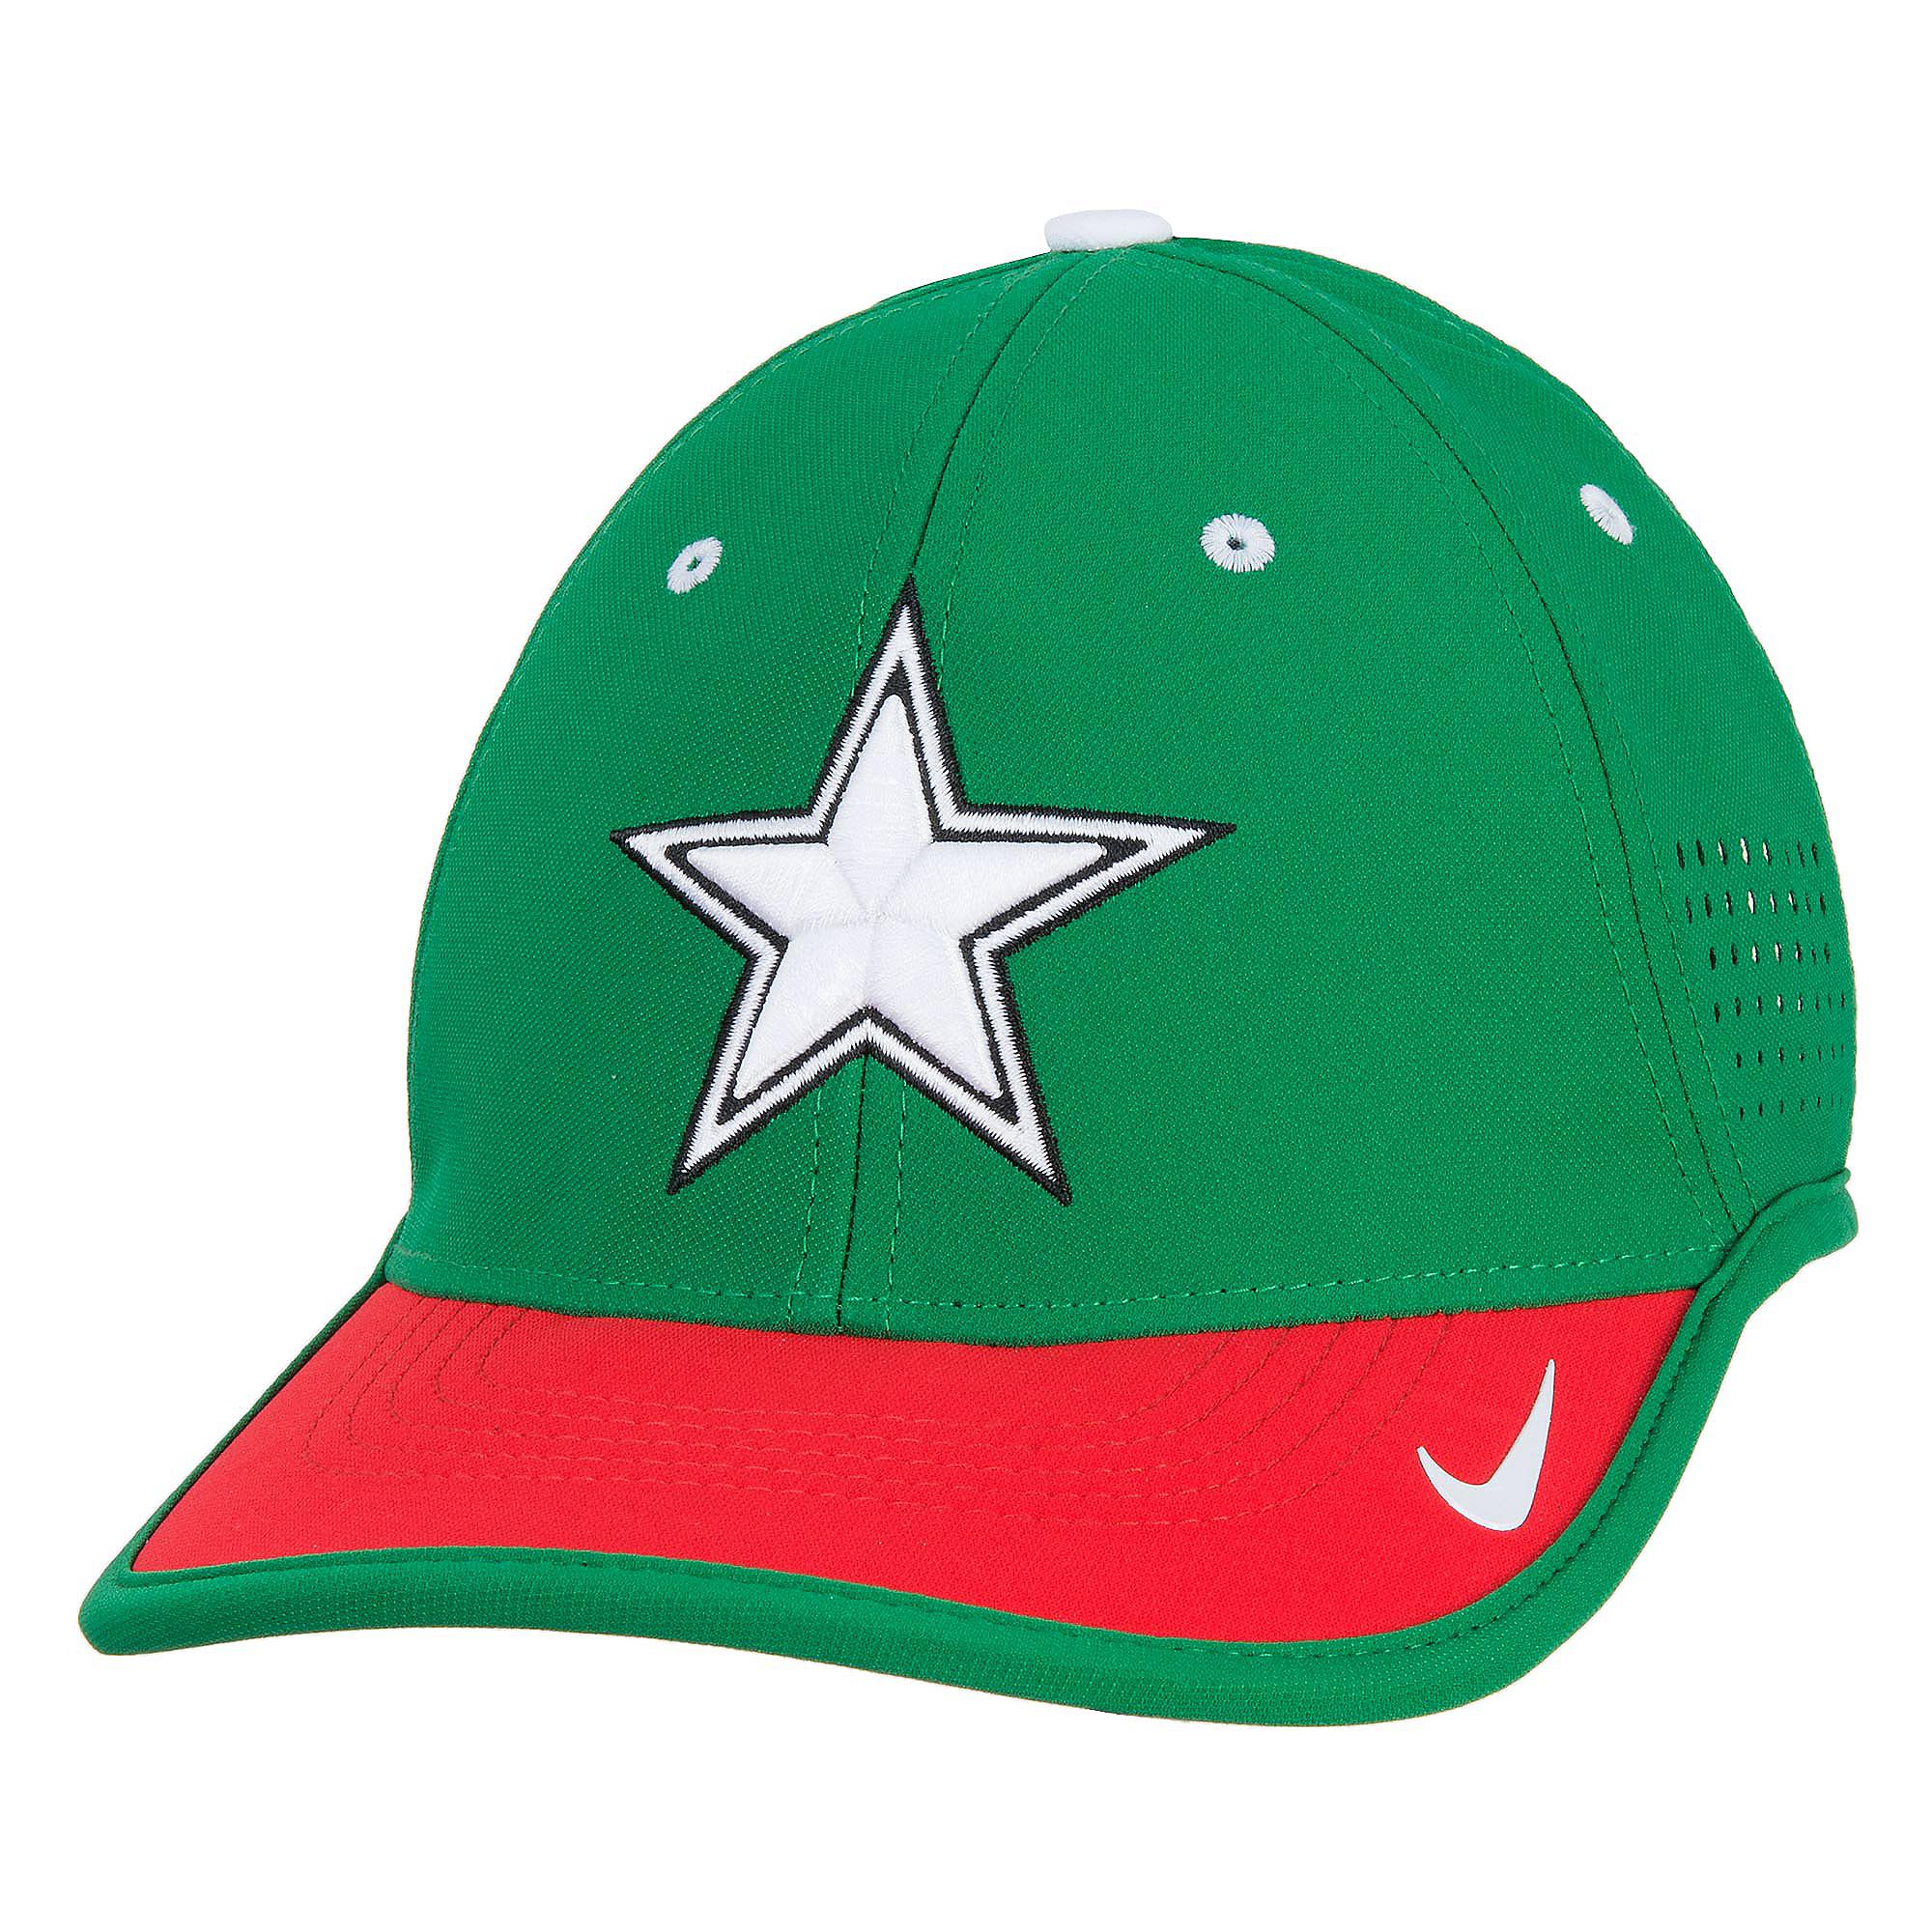 Dallas Cowboys Nike L91 Star Vapor Bill Adjustable Cap